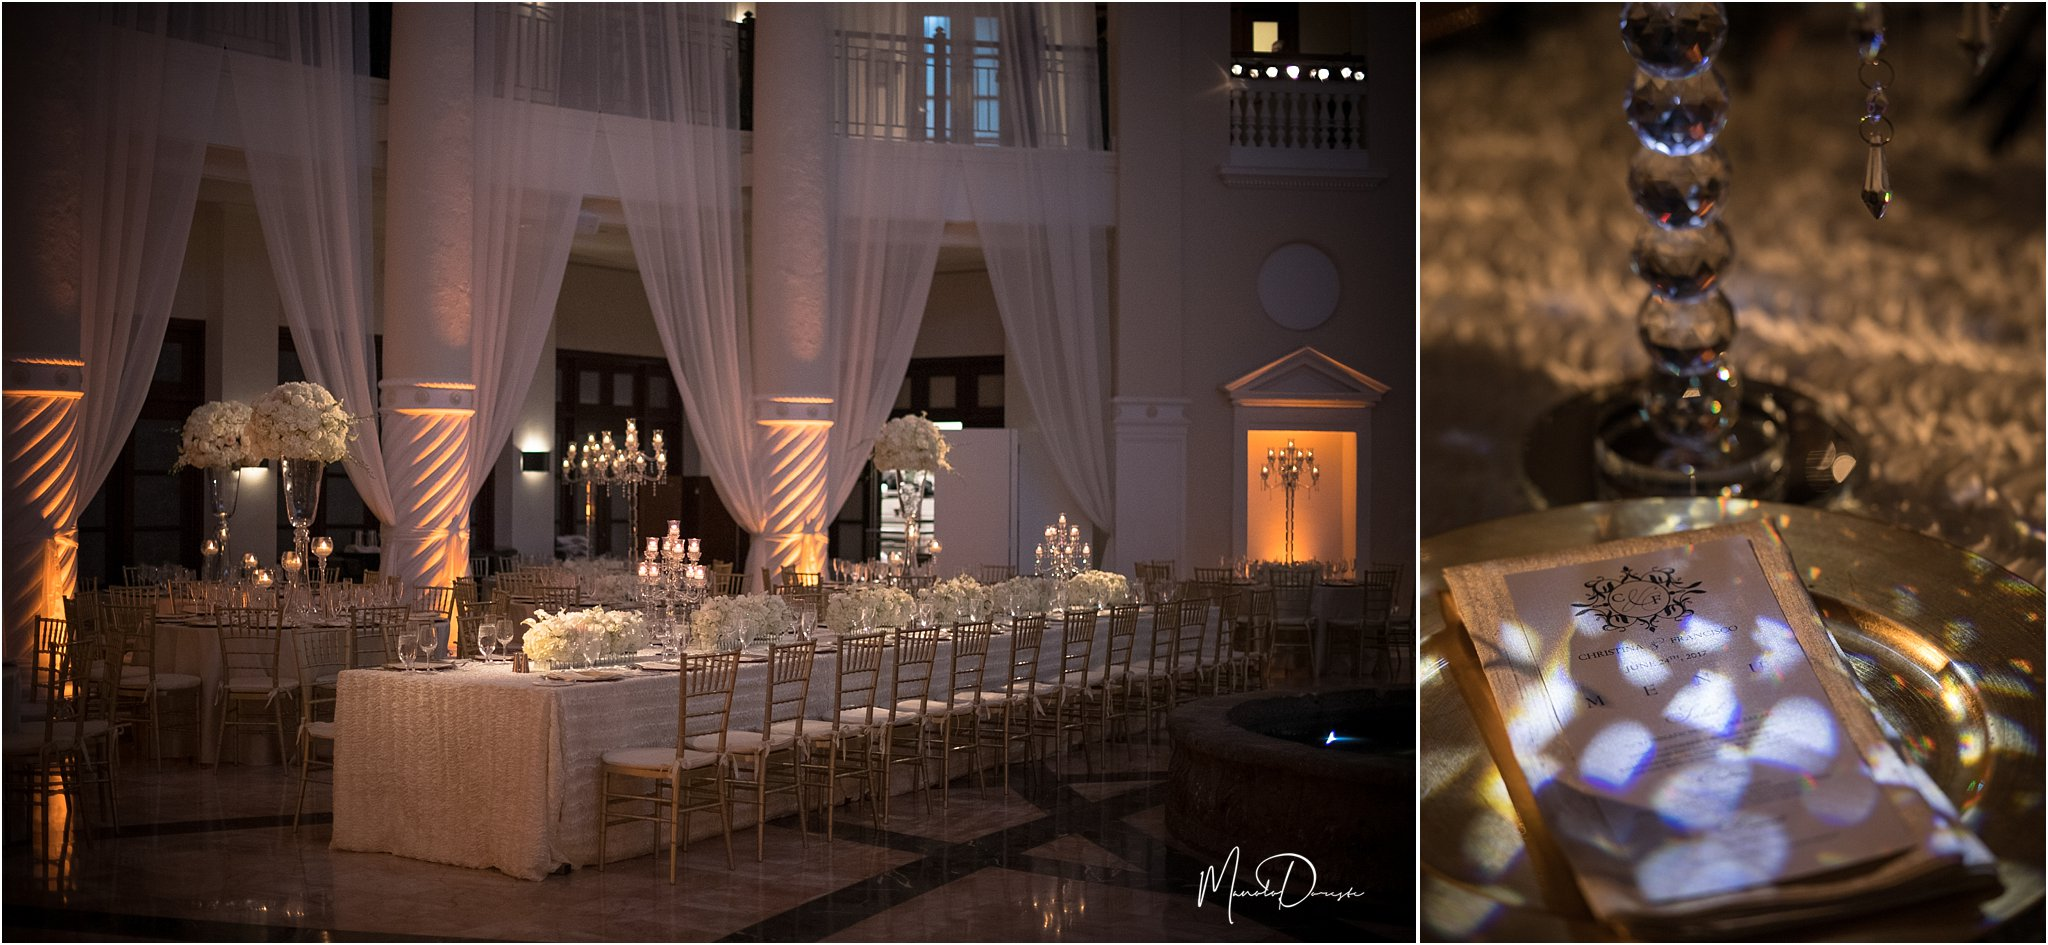 0372_ManoloDoreste_InFocusStudios_Wedding_Family_Photography_Miami_MiamiPhotographer.jpg